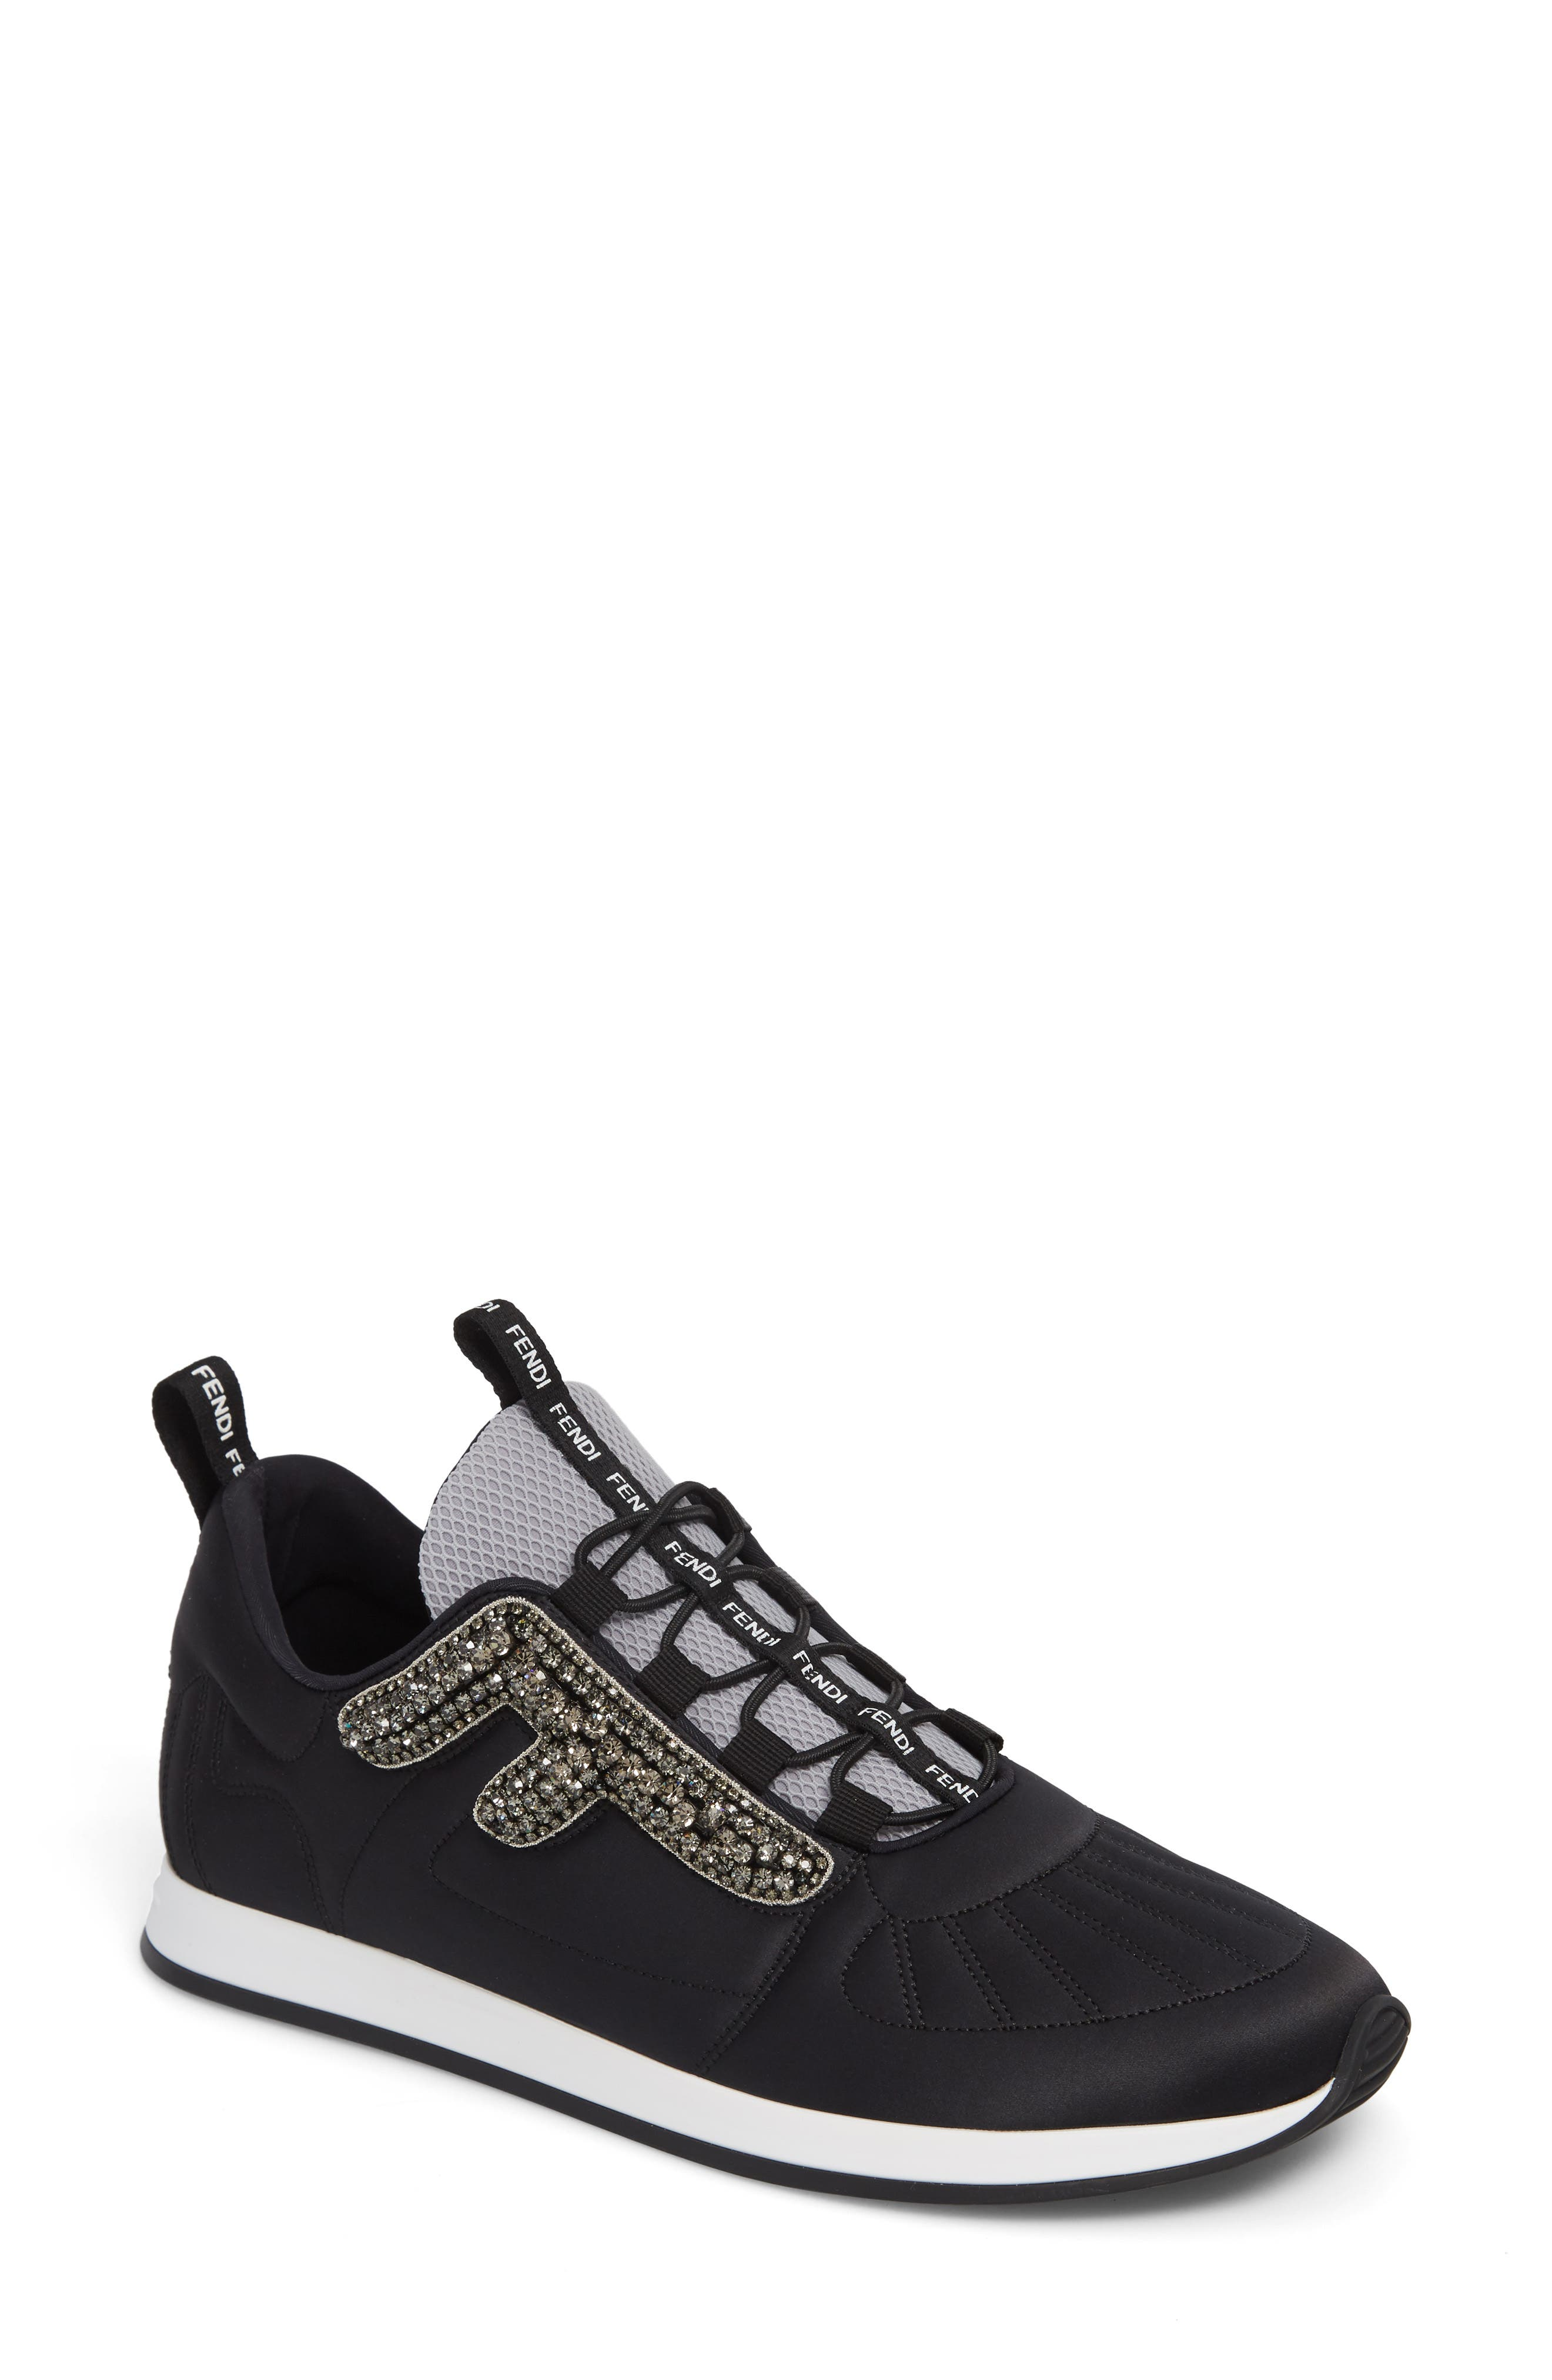 Fendi Ffreedom Jewel Embellished Sneaker - Black